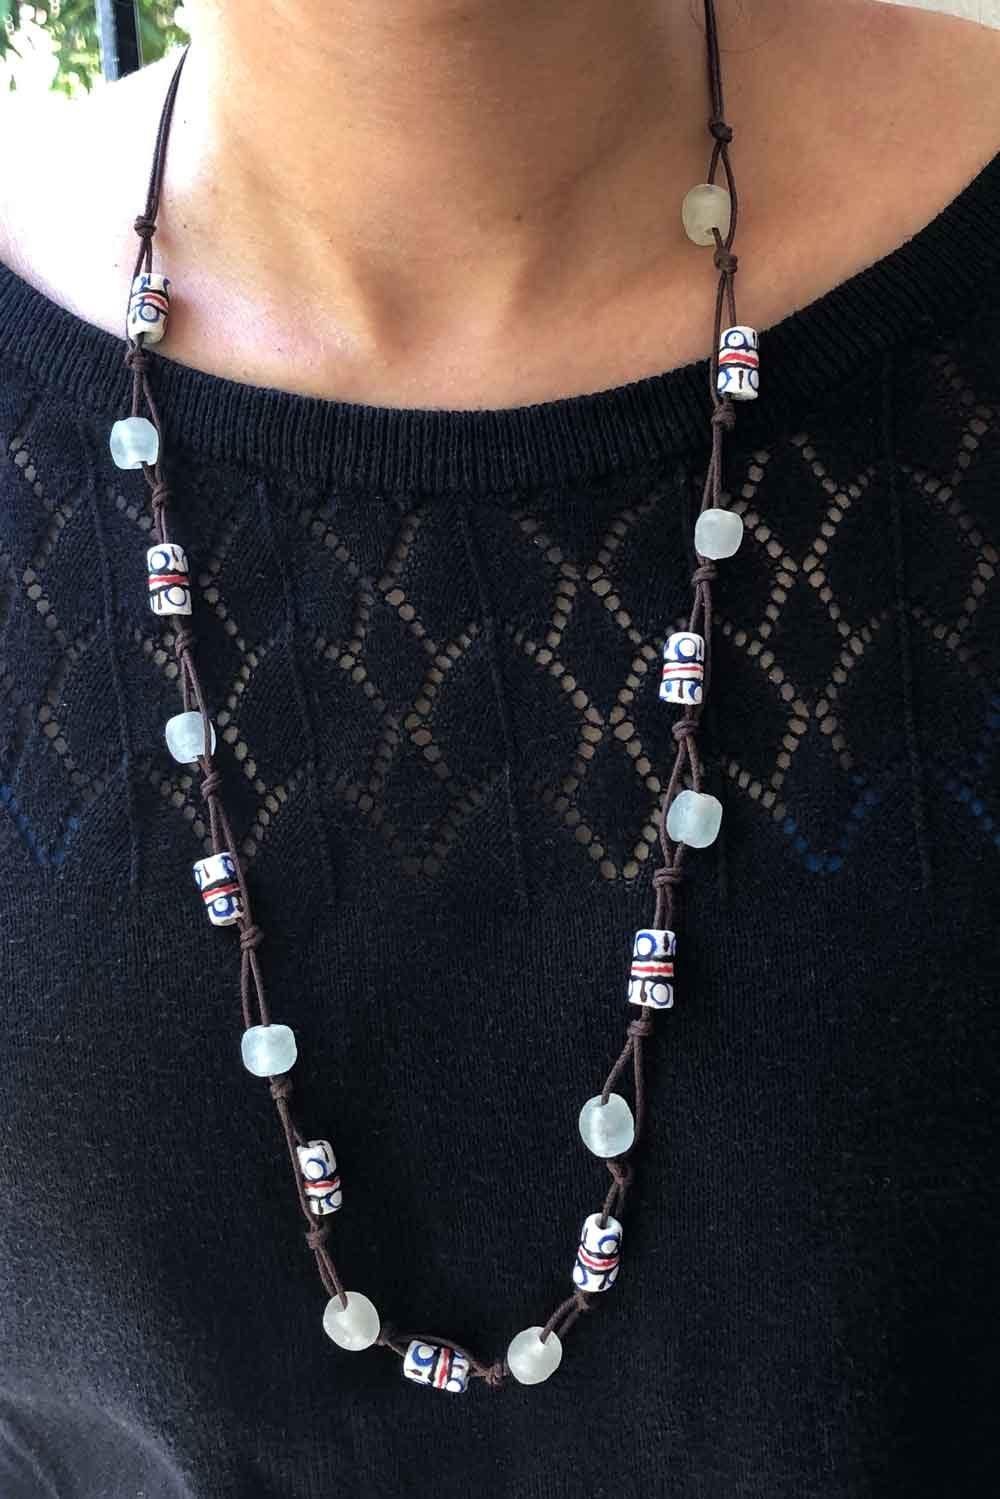 White Jiona Necklace Brown Cord by SHIKHAZURI Modelled